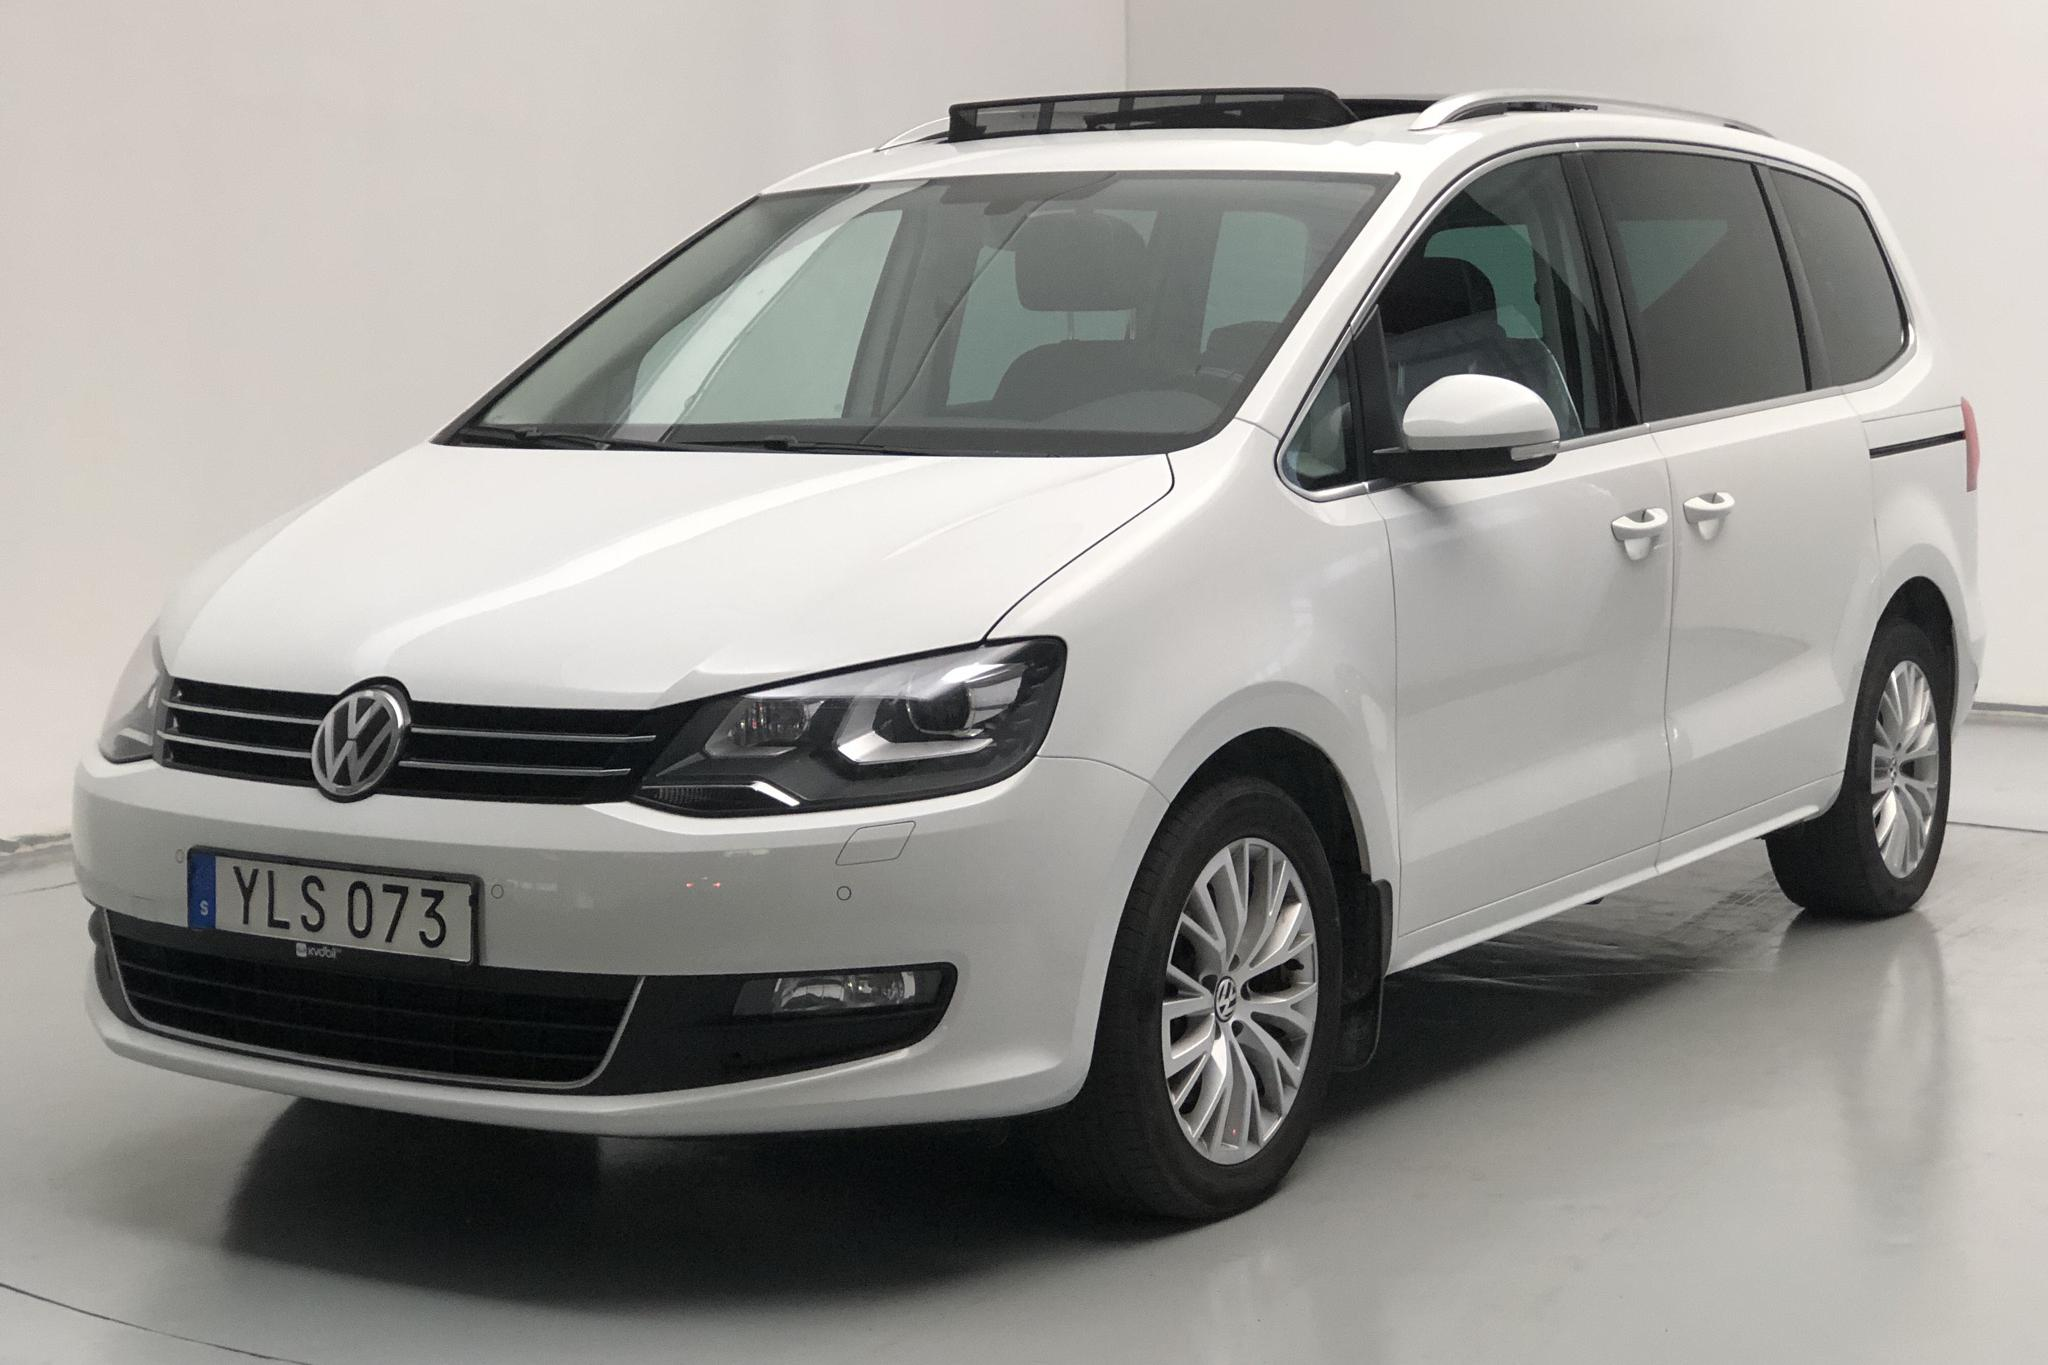 VW Sharan 2.0 TDI 4Motion (150hk)